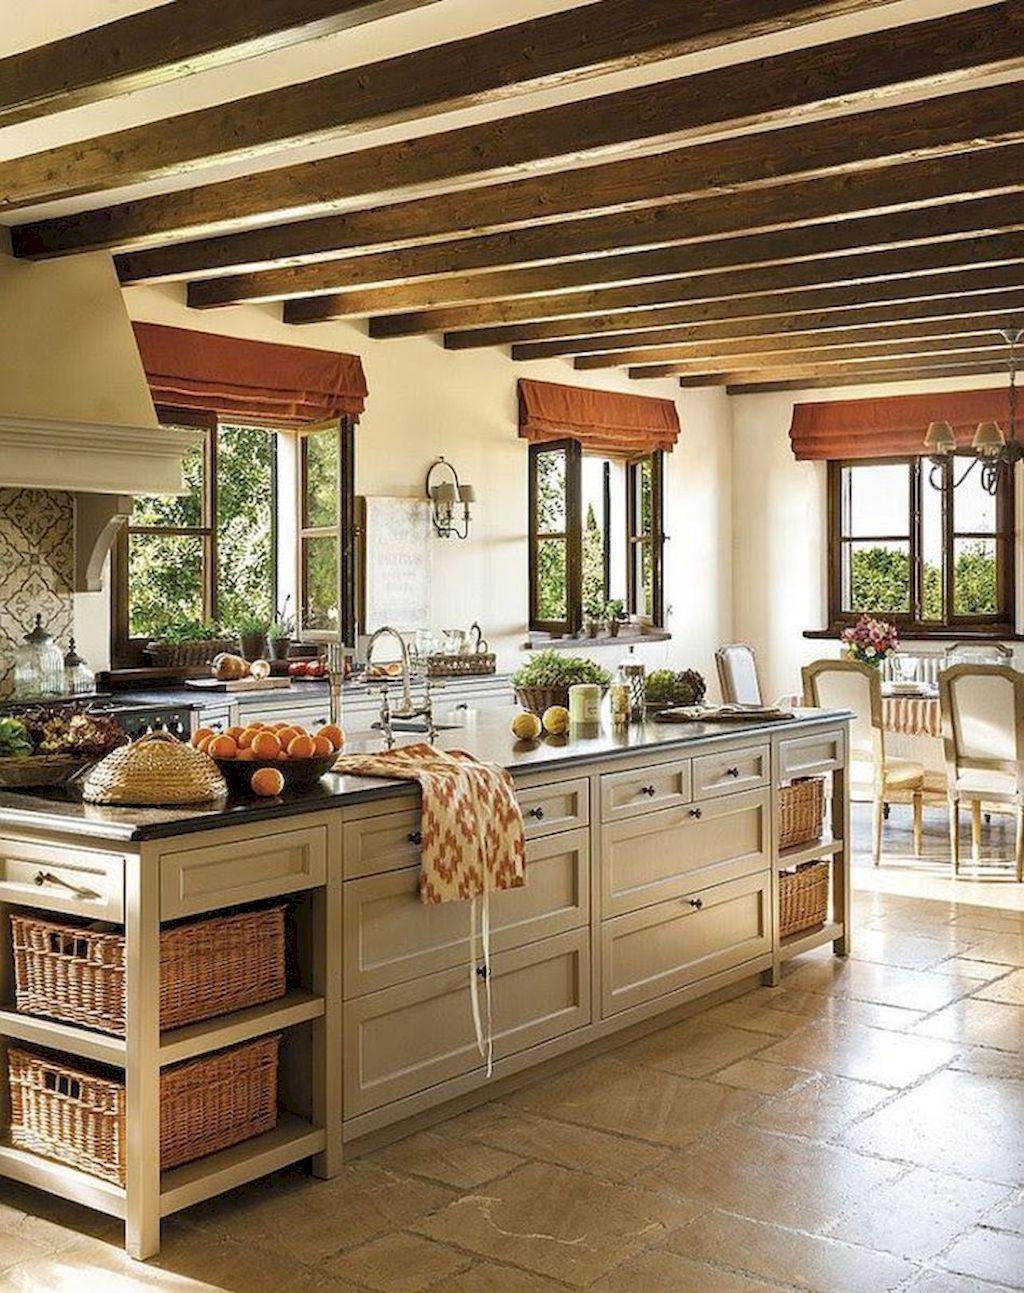 45 Best French Country Kitchen Design Ideas | Pinterest ...